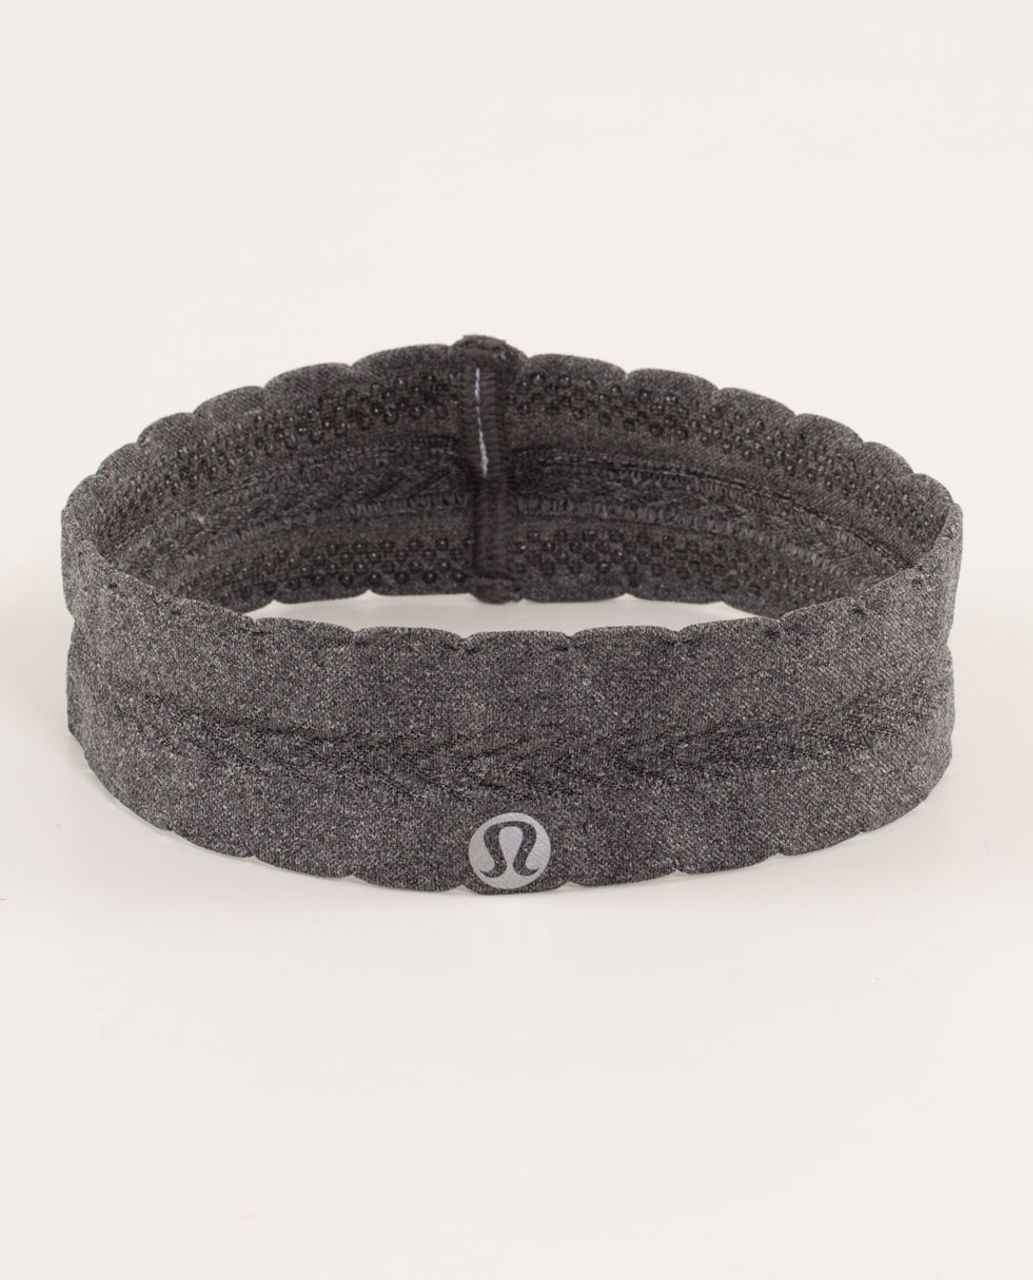 Lululemon Swiftly Headband *Special Edition - Black